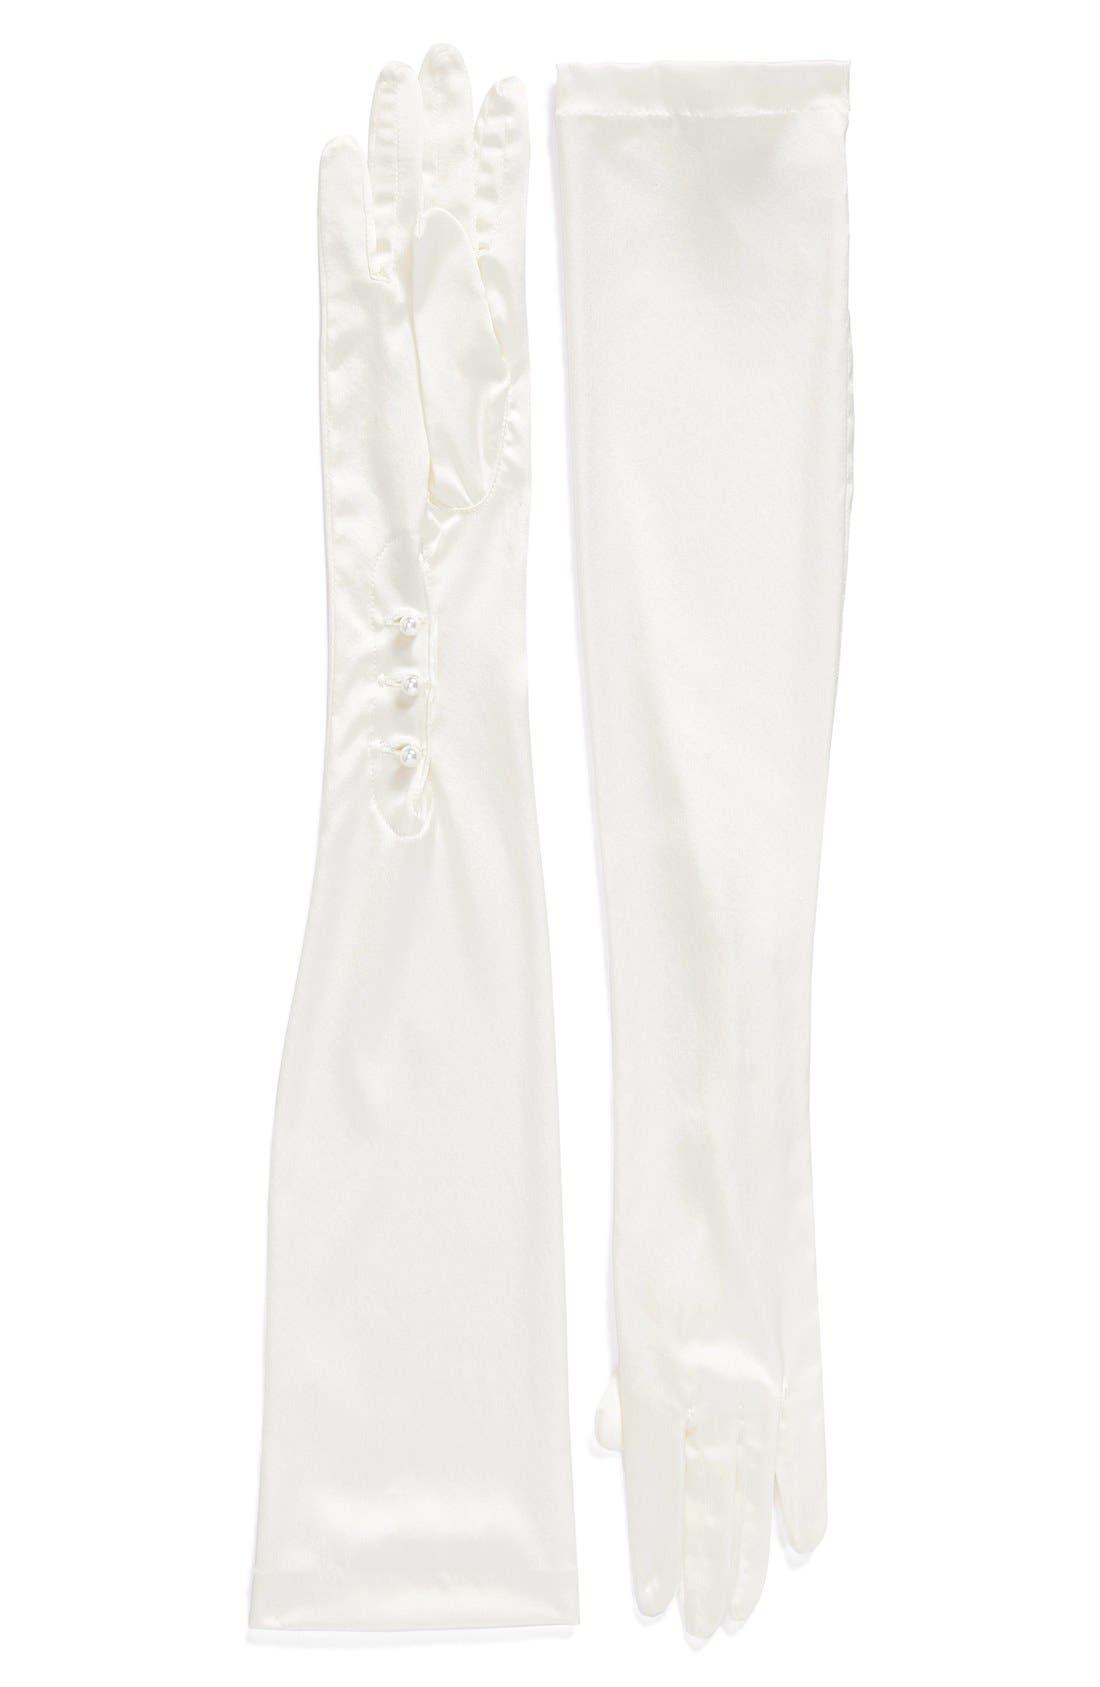 Alternate Image 1 Selected - CAROLINA AMATO Opera Length Mousquetaire Stretch Silk Gloves